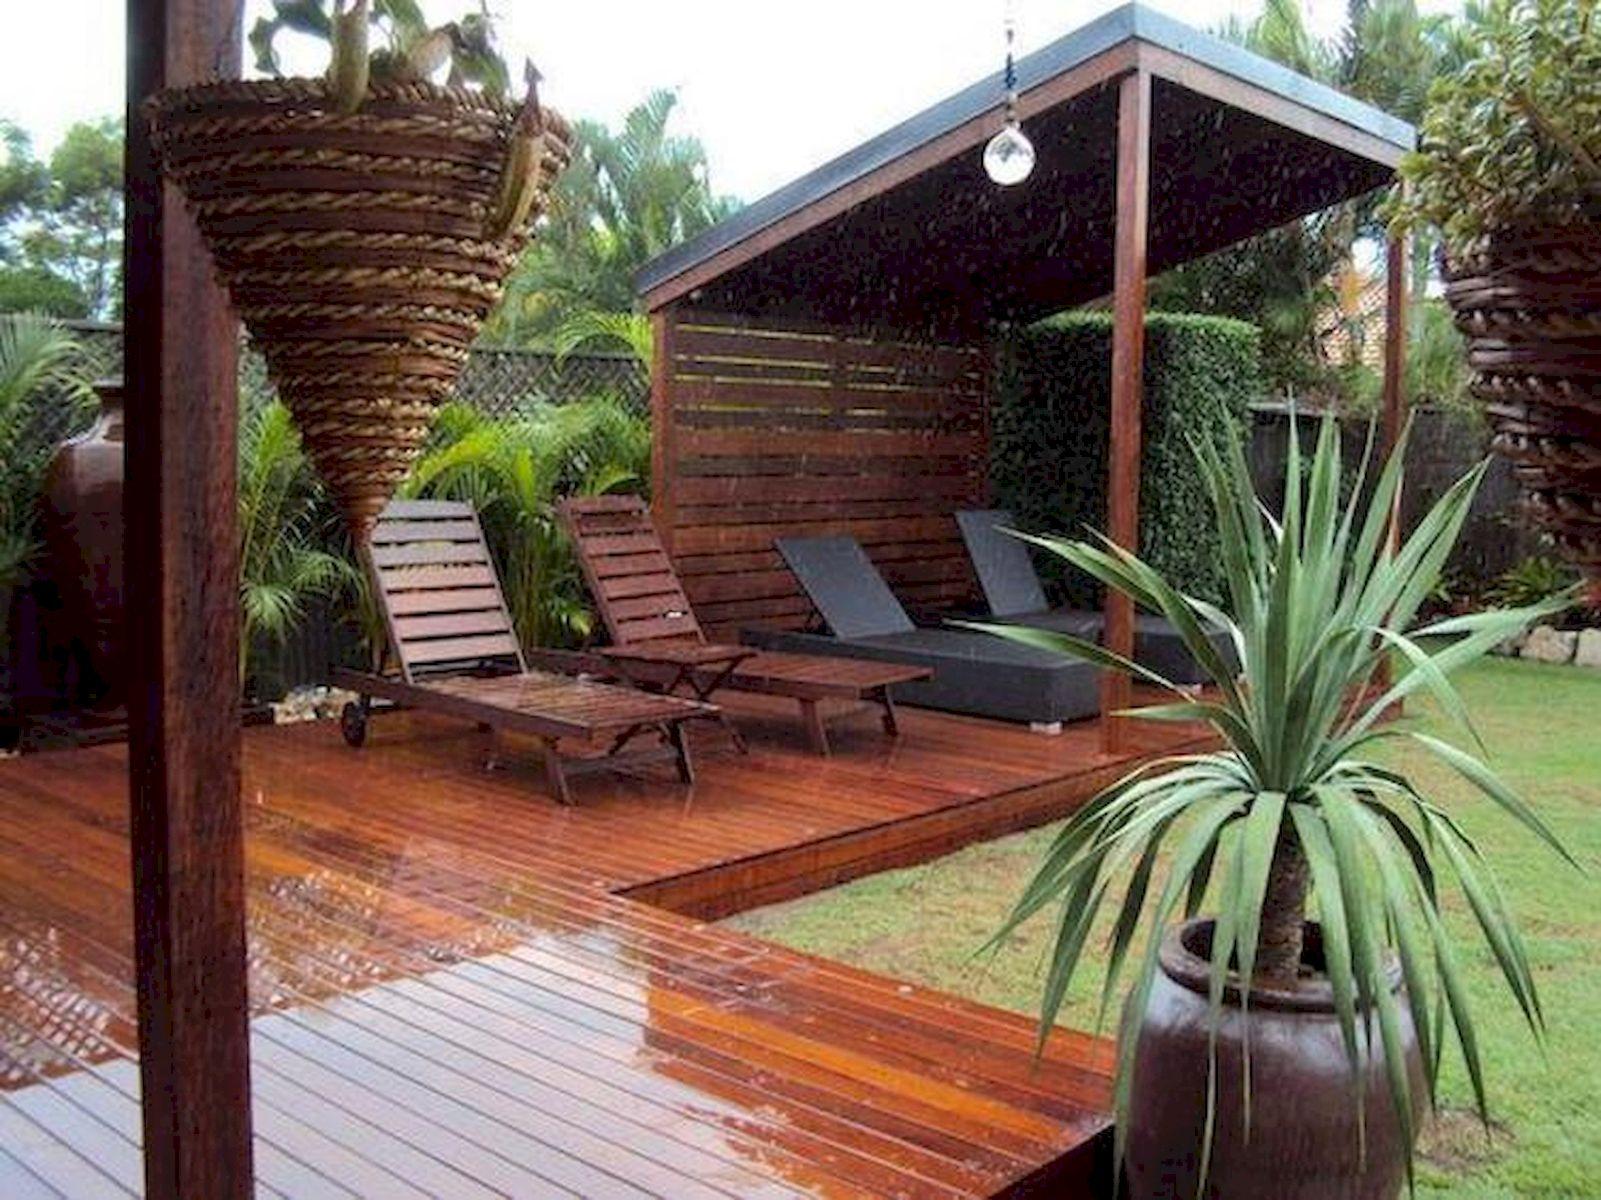 60 Awesome DIY Backyard Privacy Design And Decor Ideas (56)